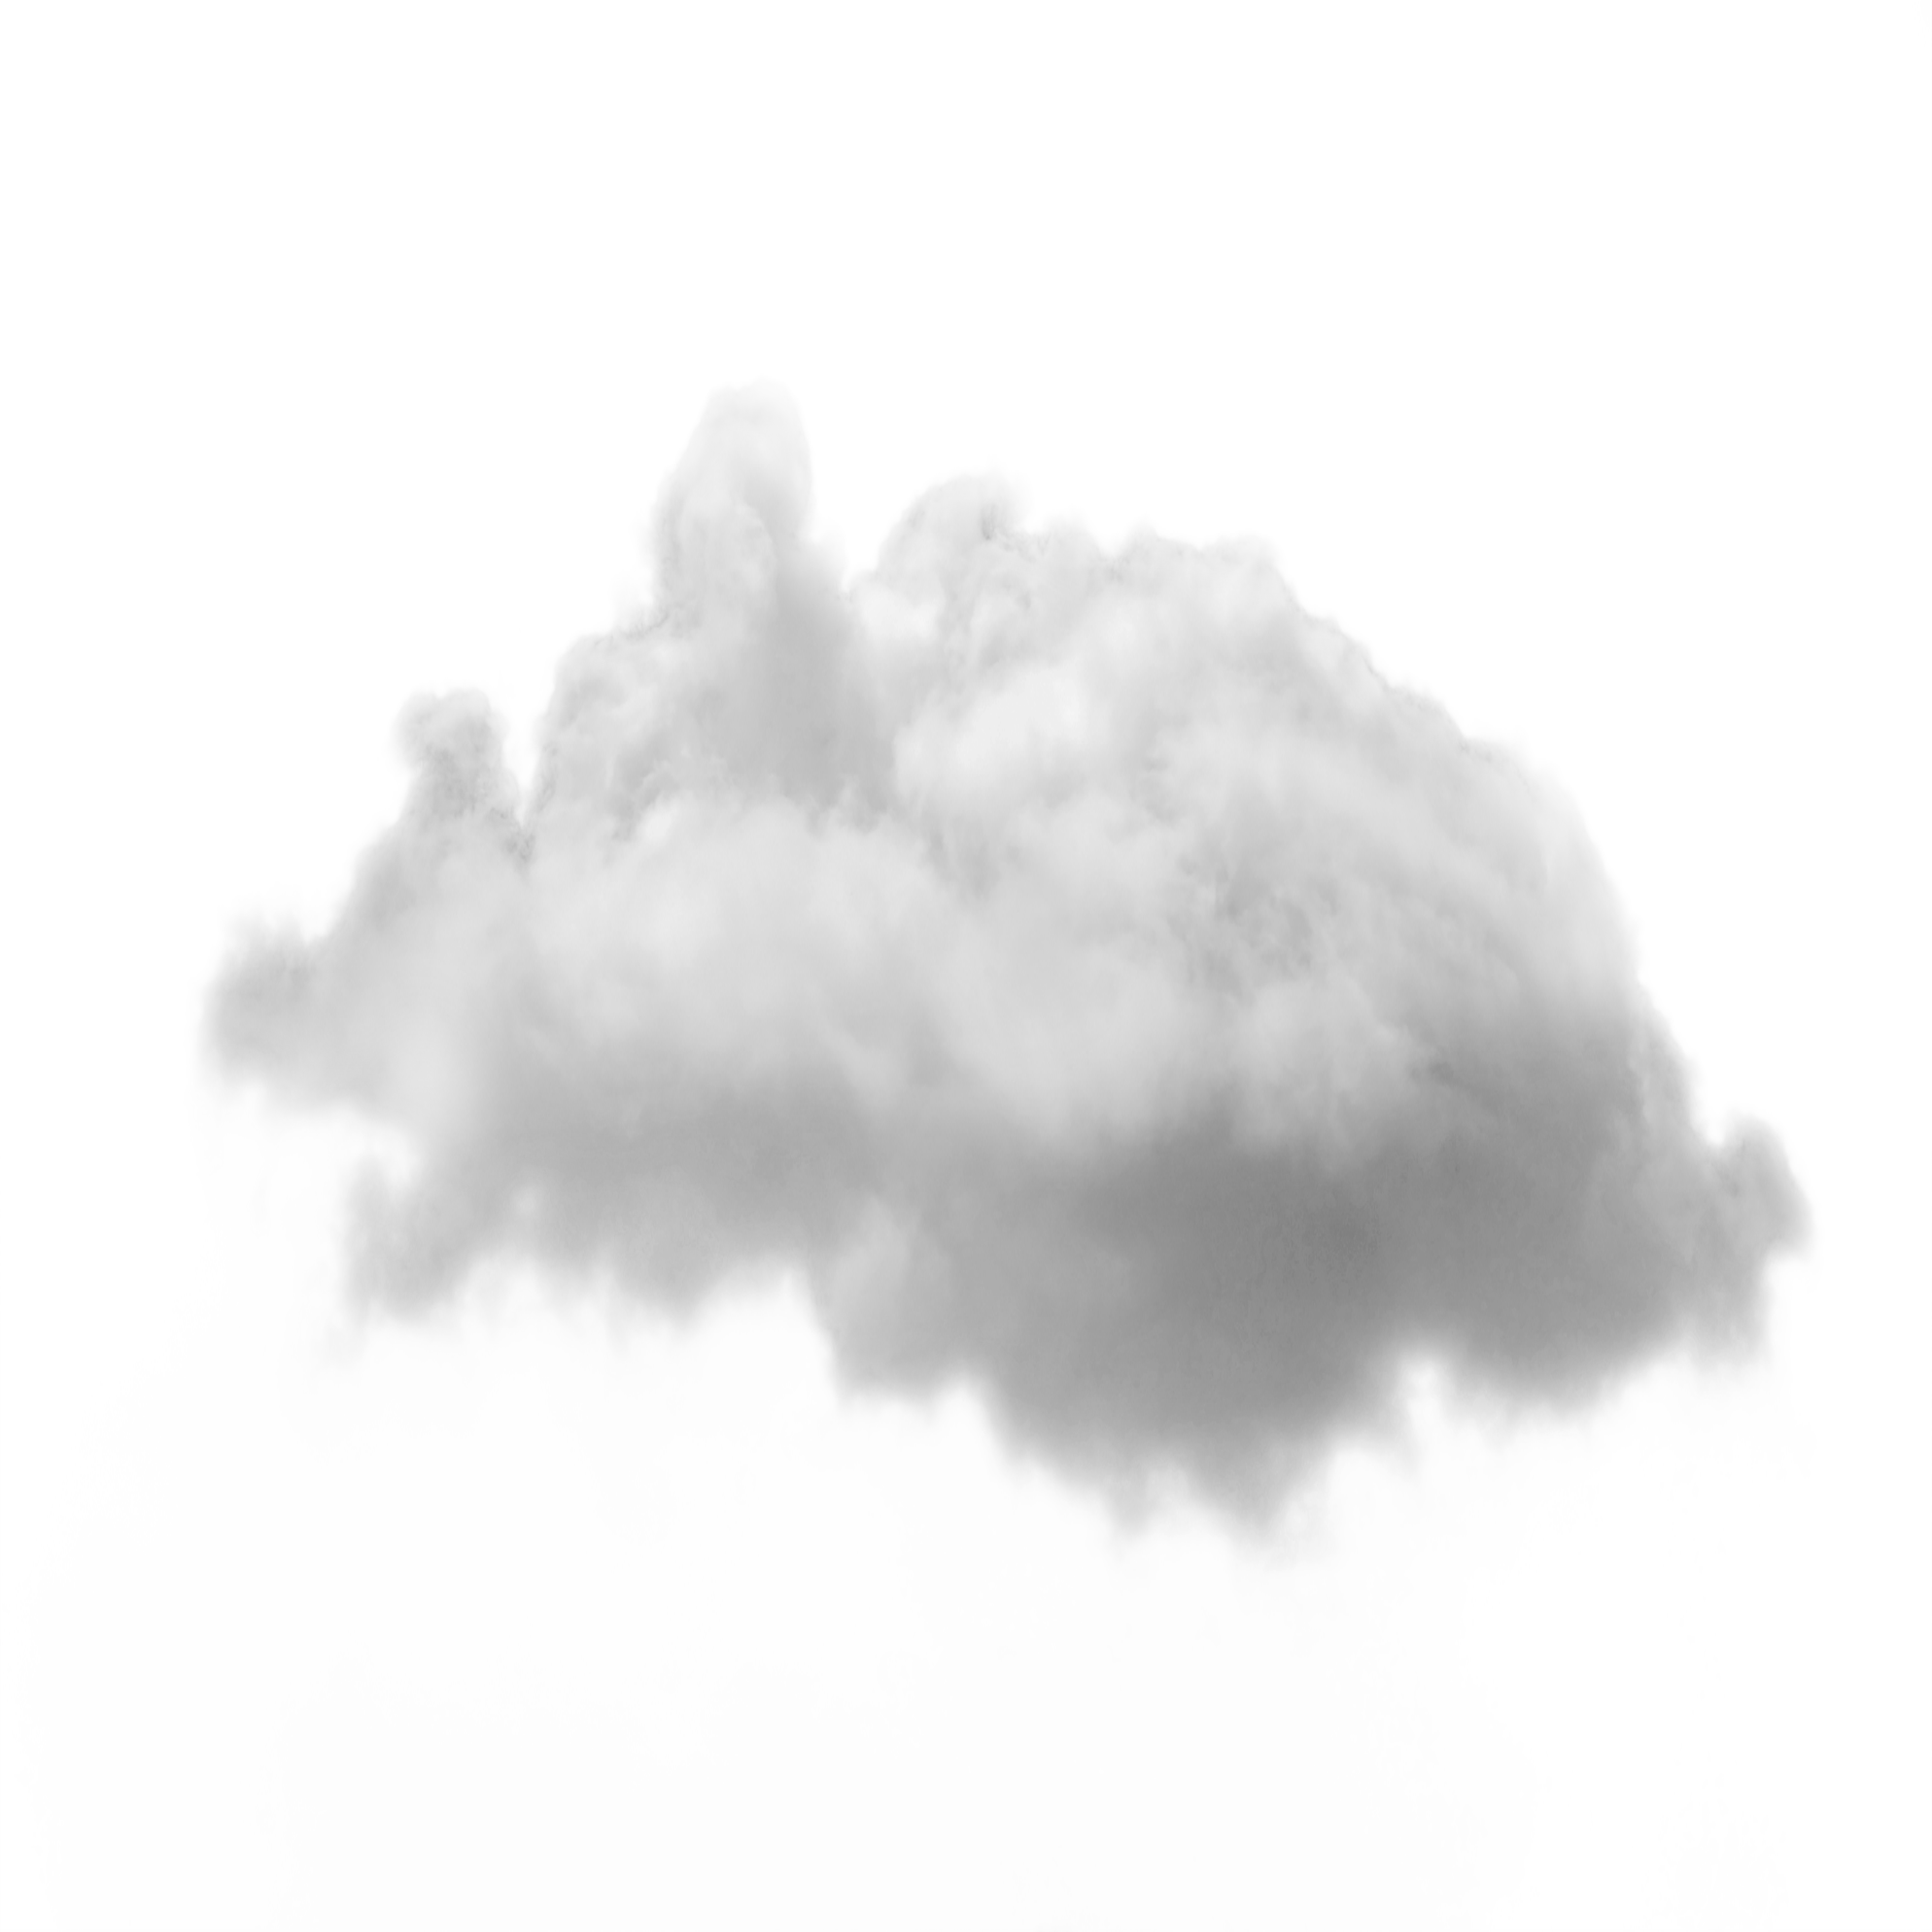 Clouds hd images transparent. Smoke cloud png